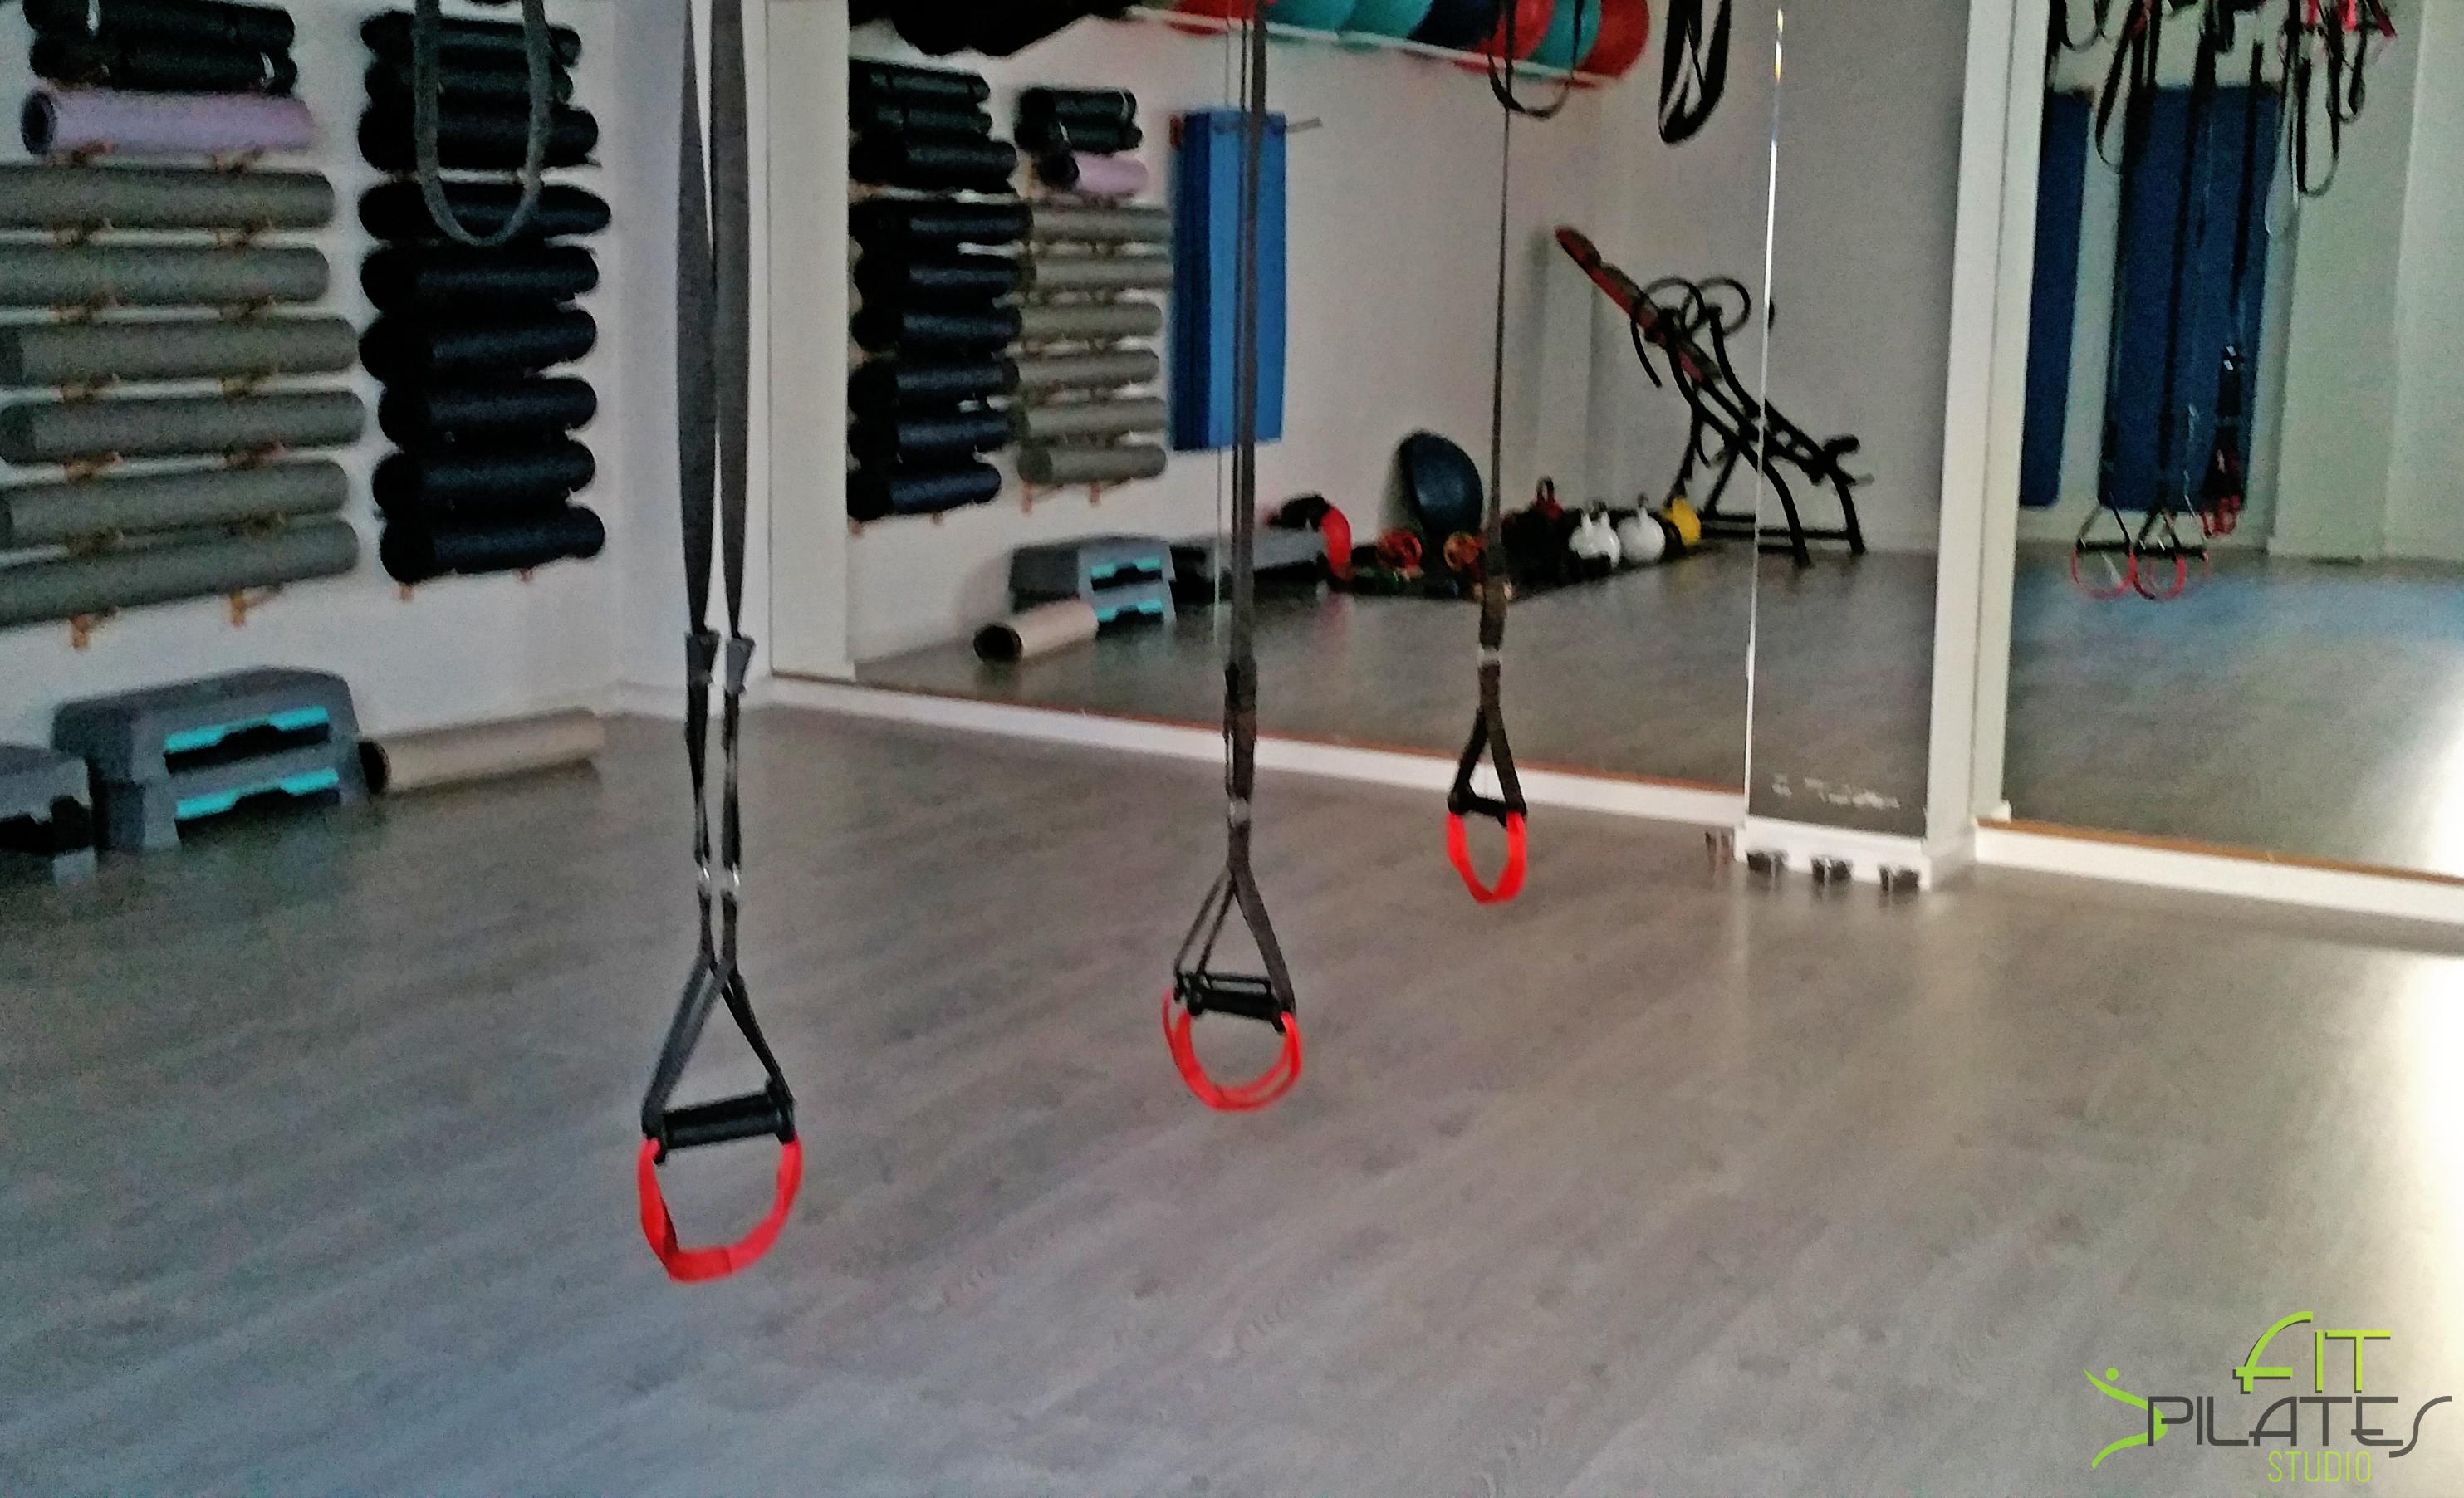 Fit Pilates Studio TRX